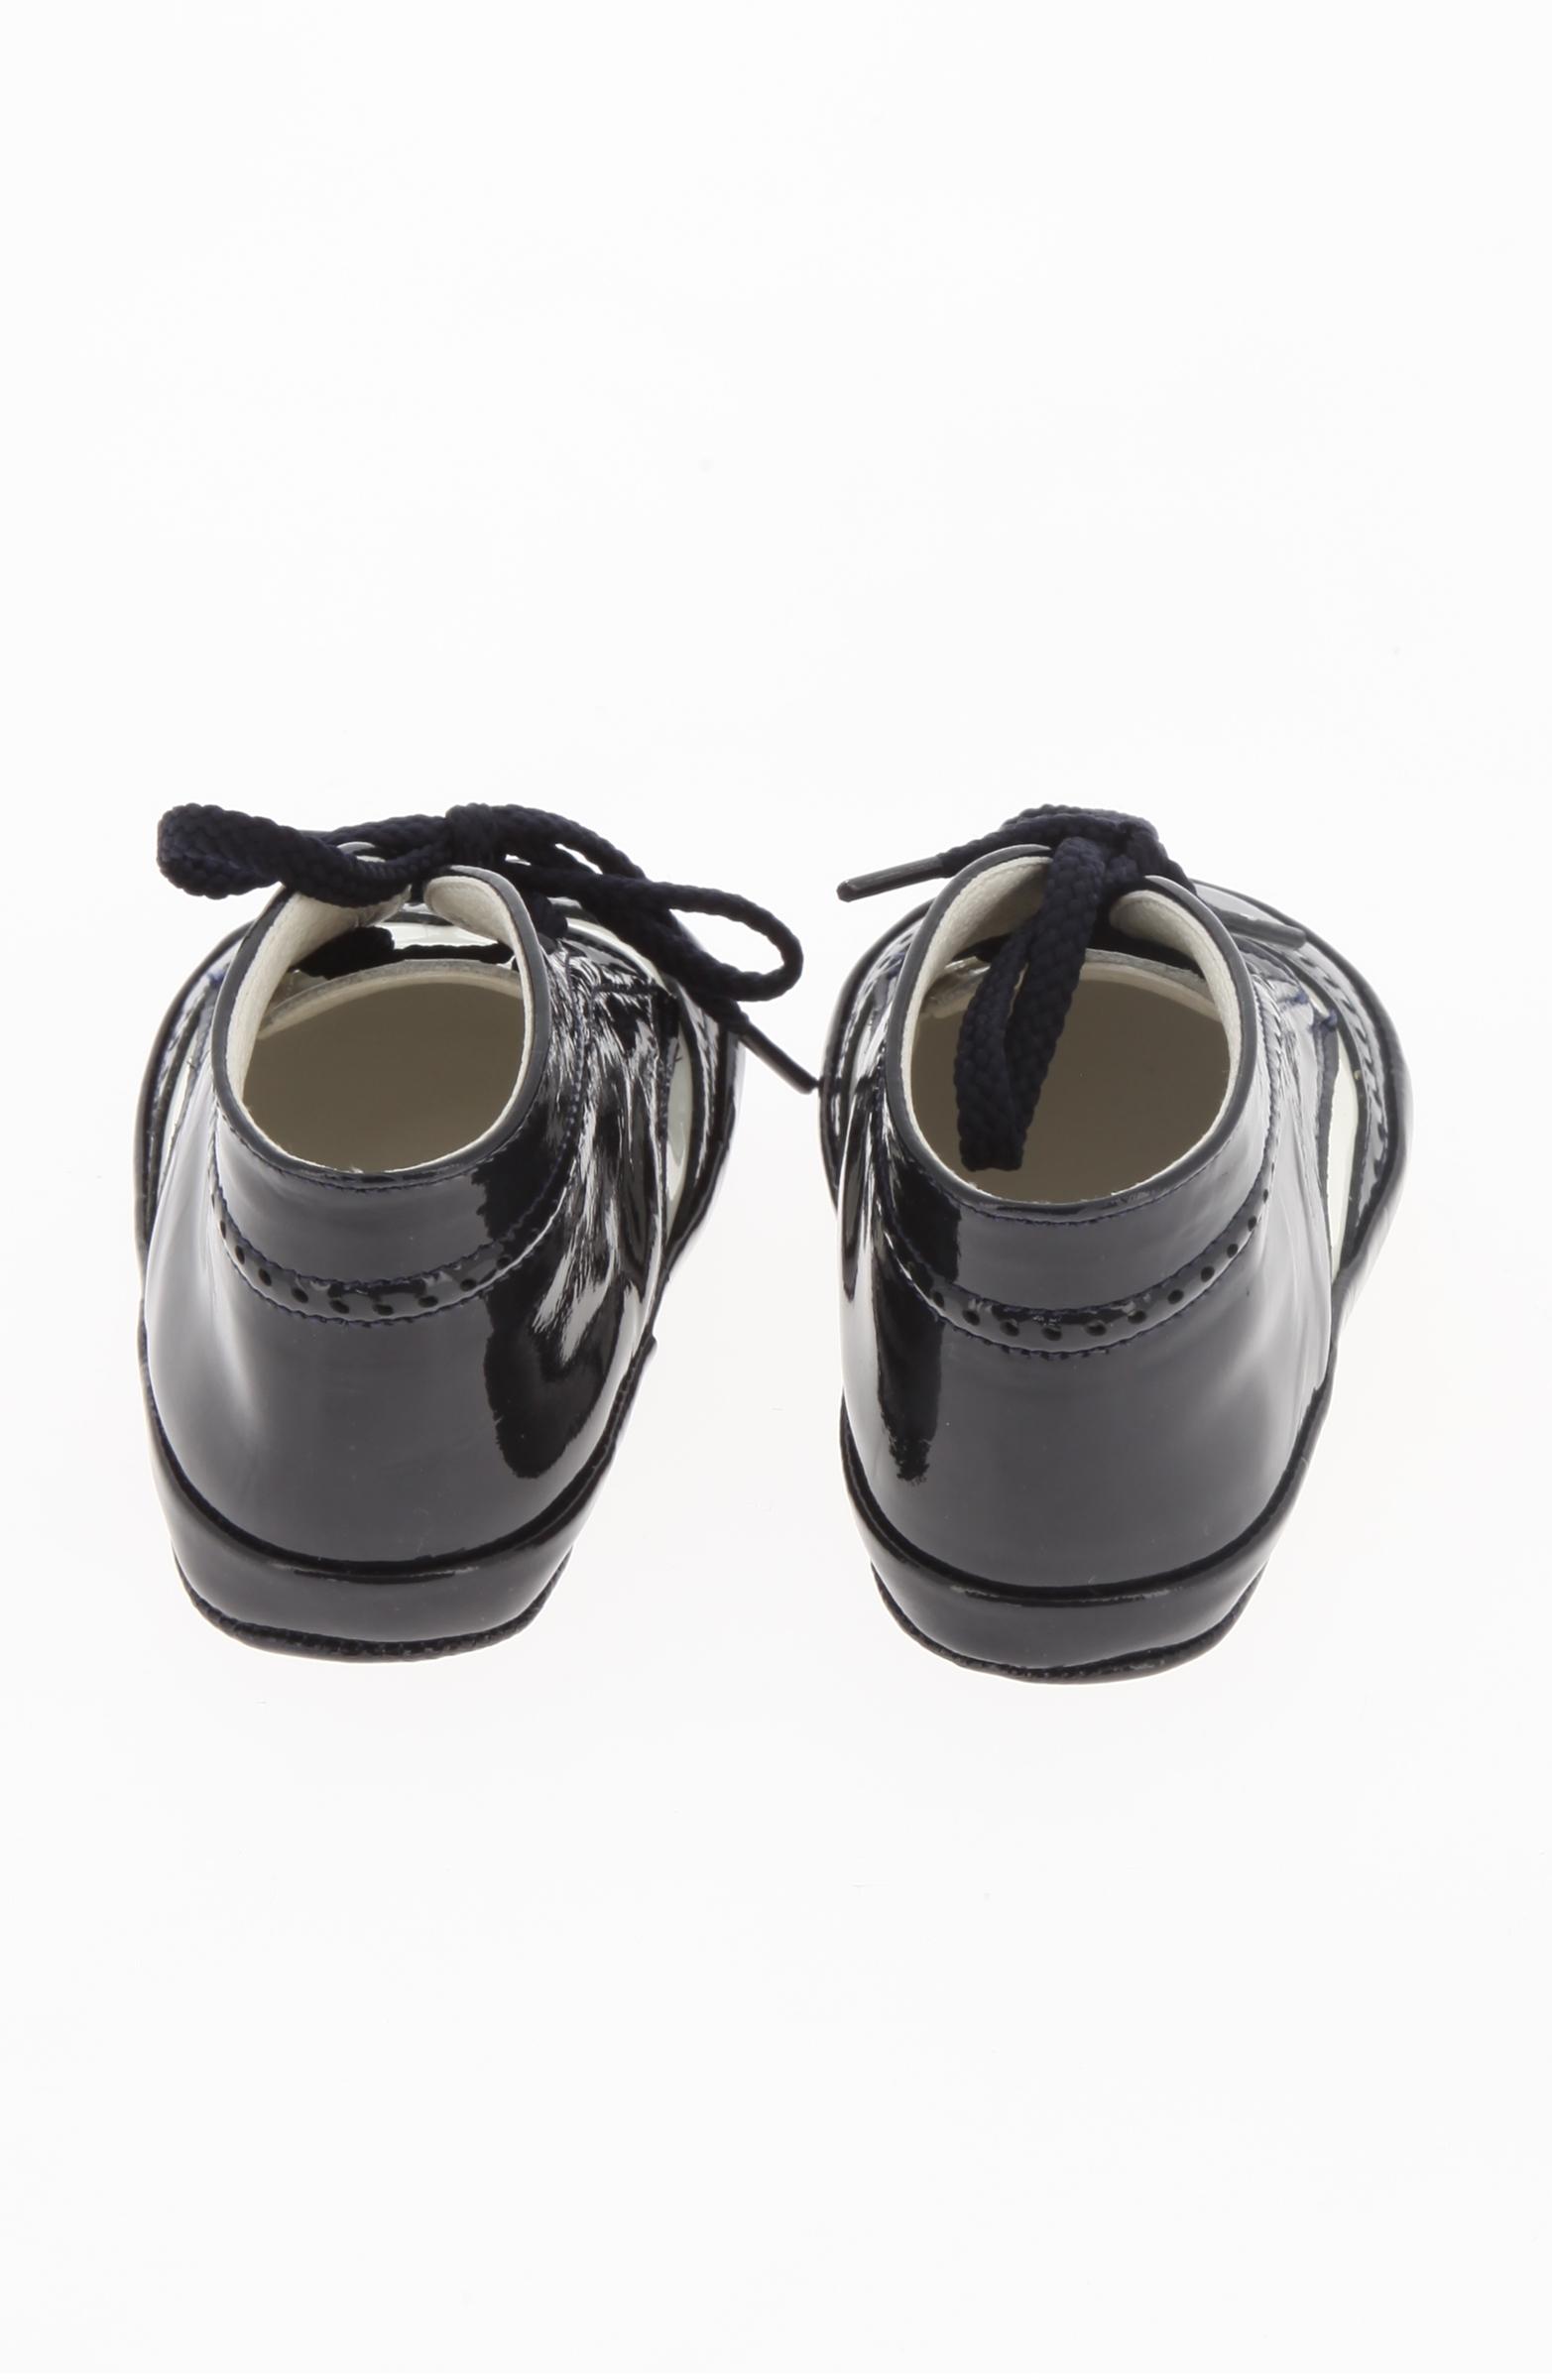 Josephine scarpe JOSEPHINE | Scarpe da culla | SCARPABIANCOBLUSV